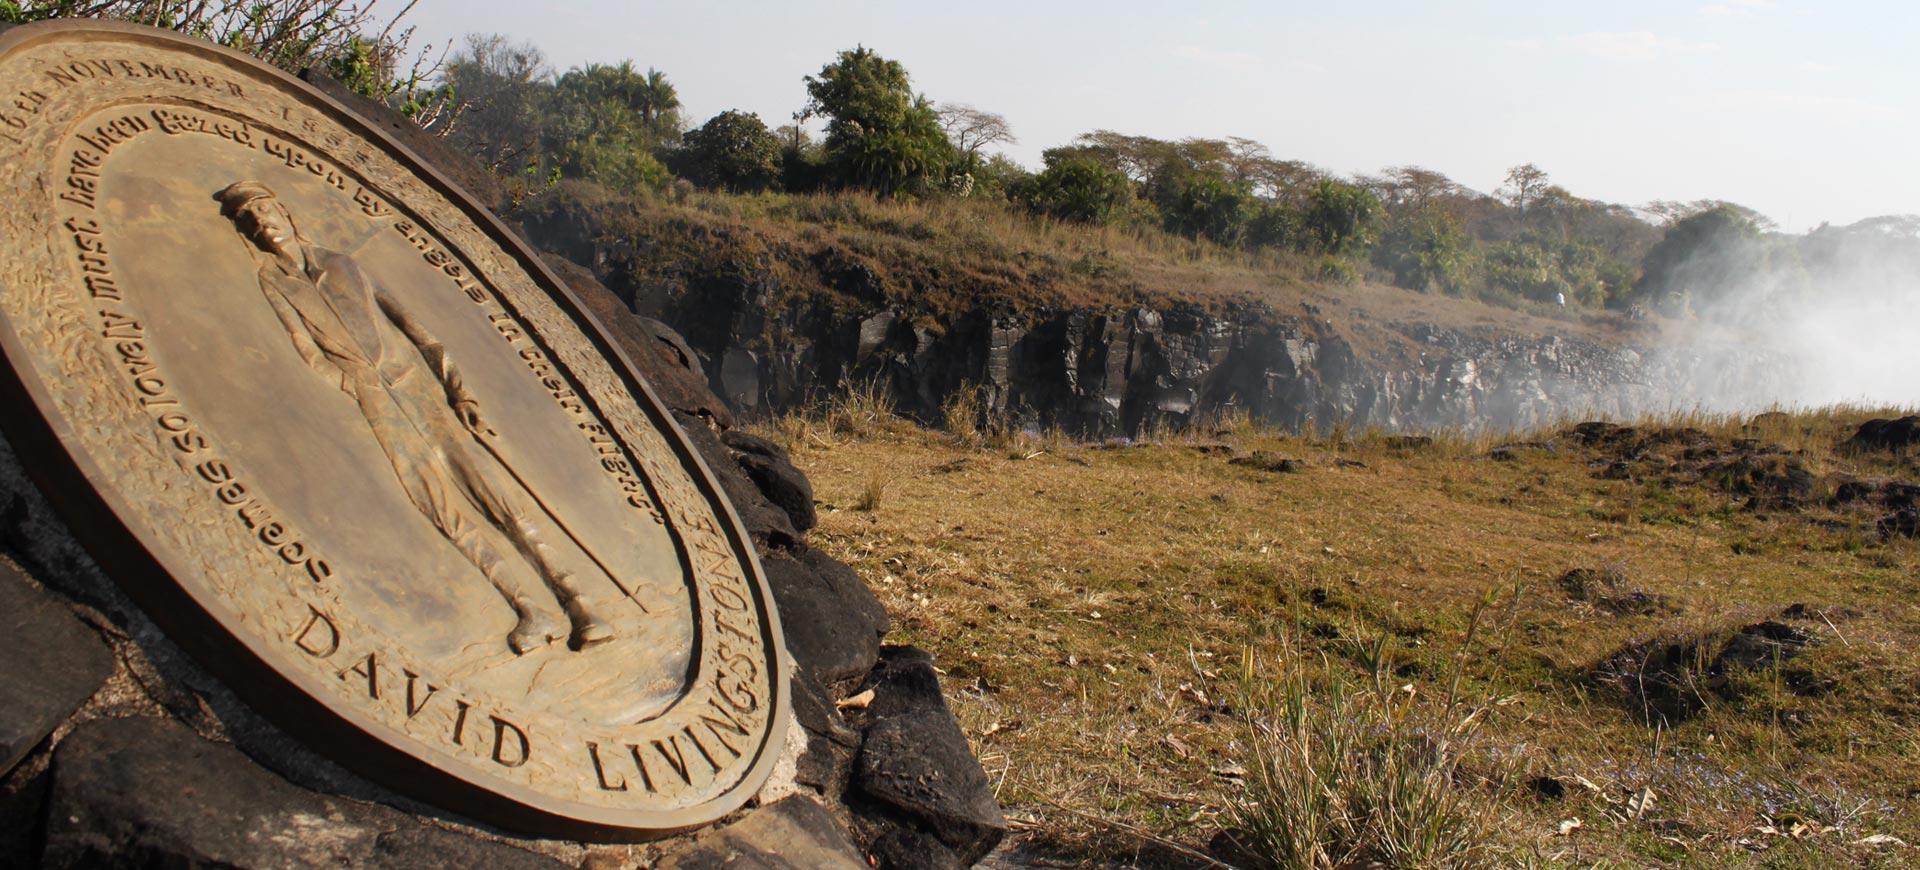 Livingstone Statue Livingstone Island